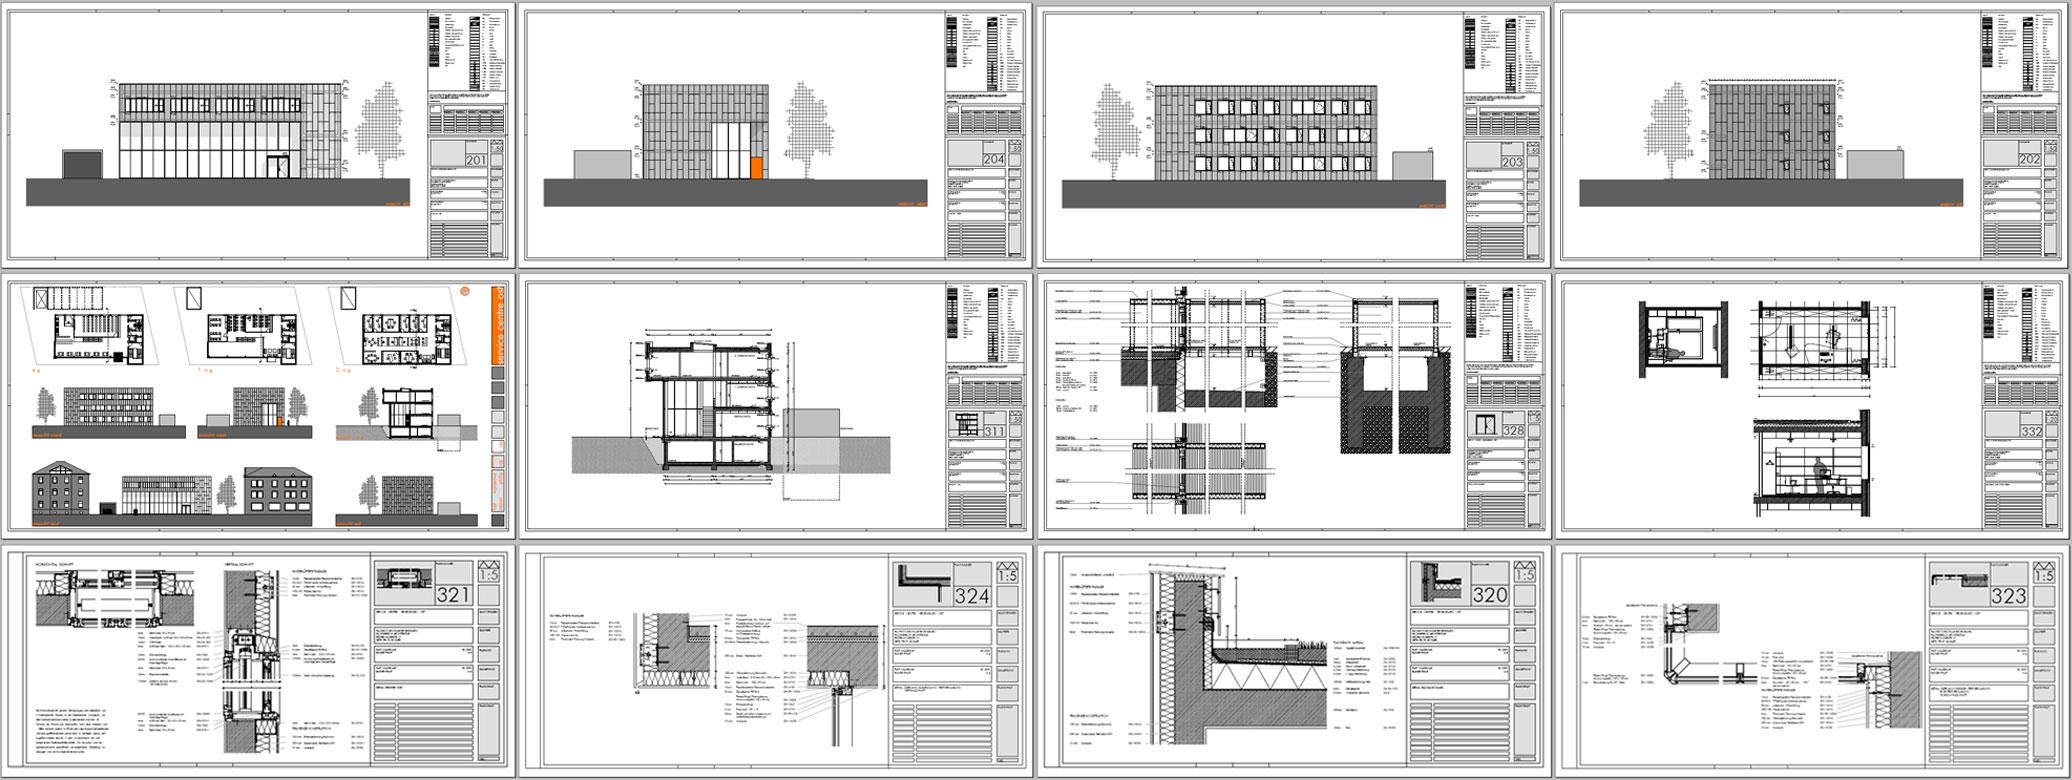 Baukonstruktion gebäudetechnik 2oo5 regensburg